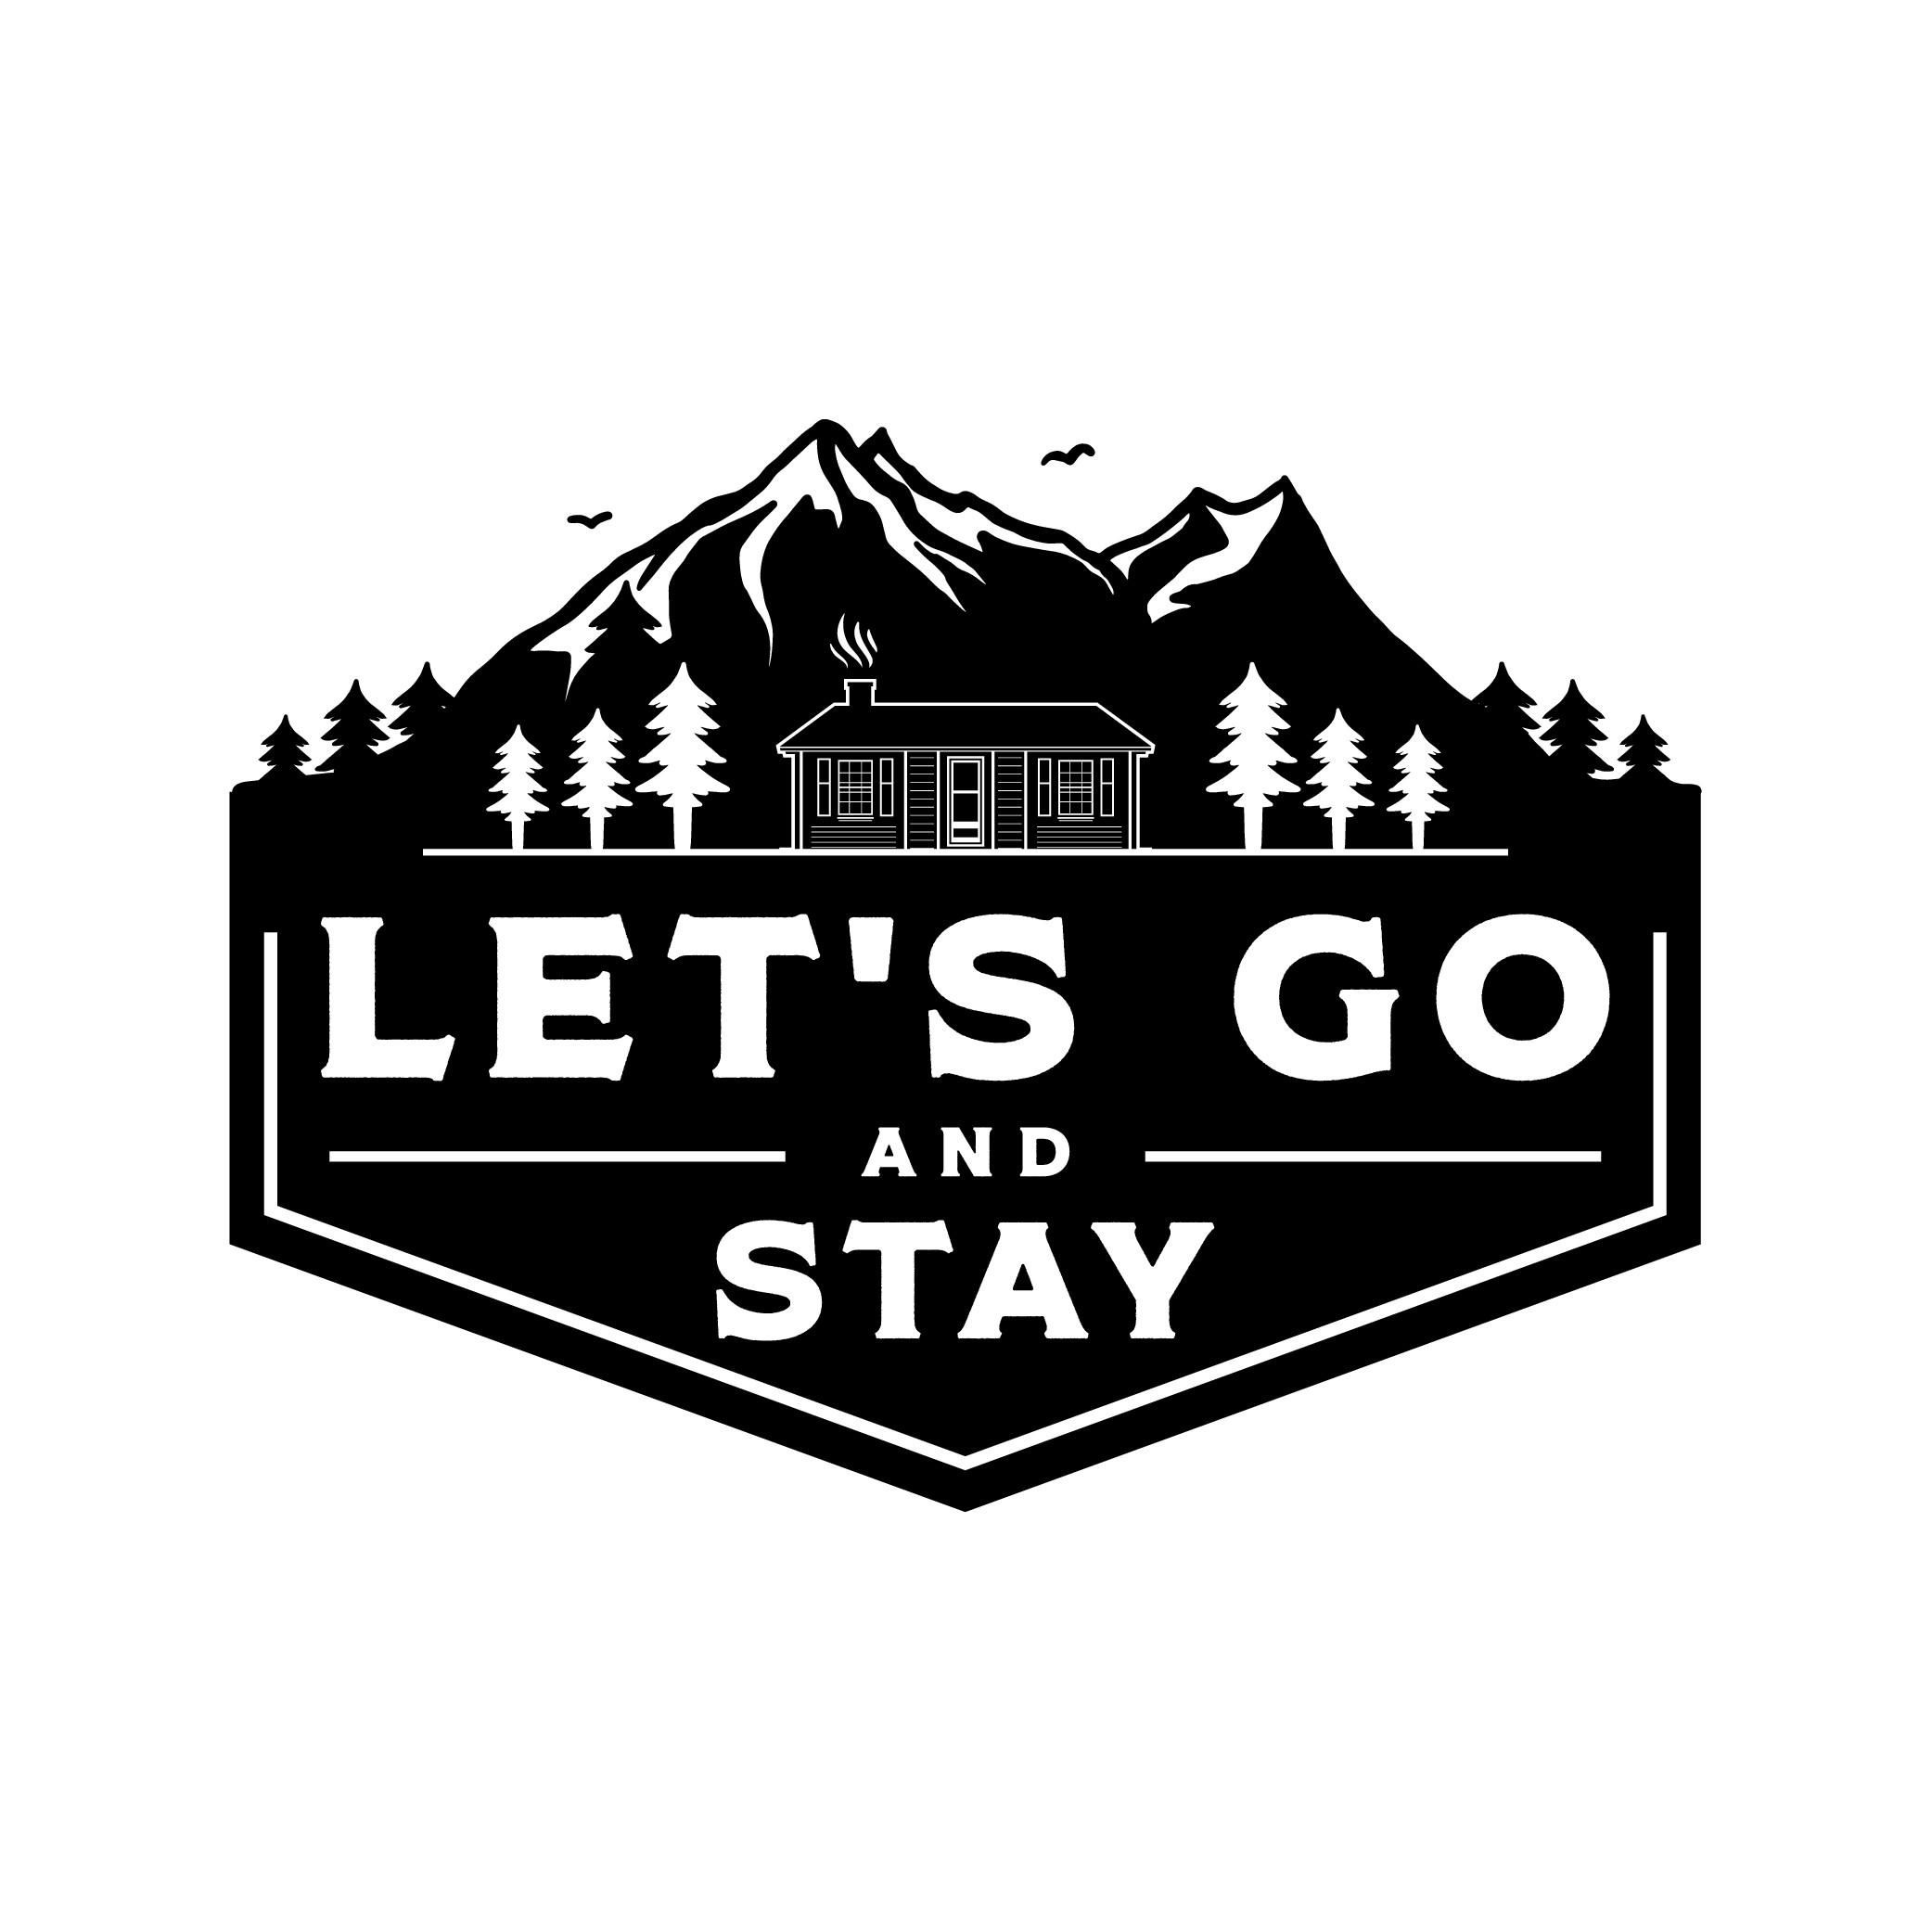 Design a logo for a unique short-term rental company